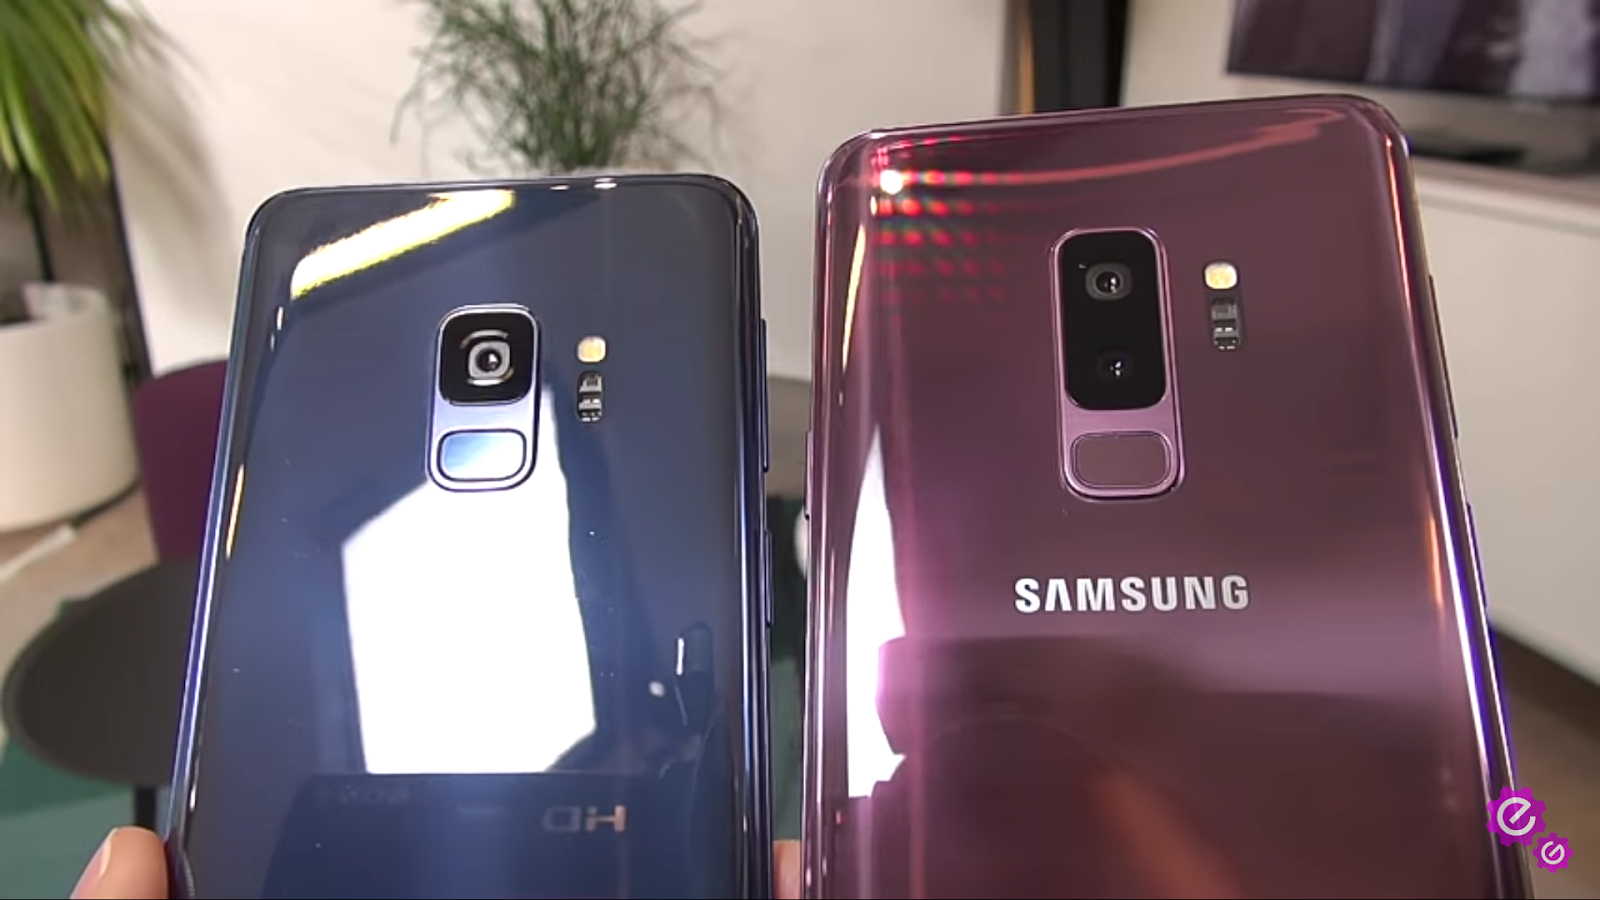 Samsung galaxy s9 fingerprint reader placements